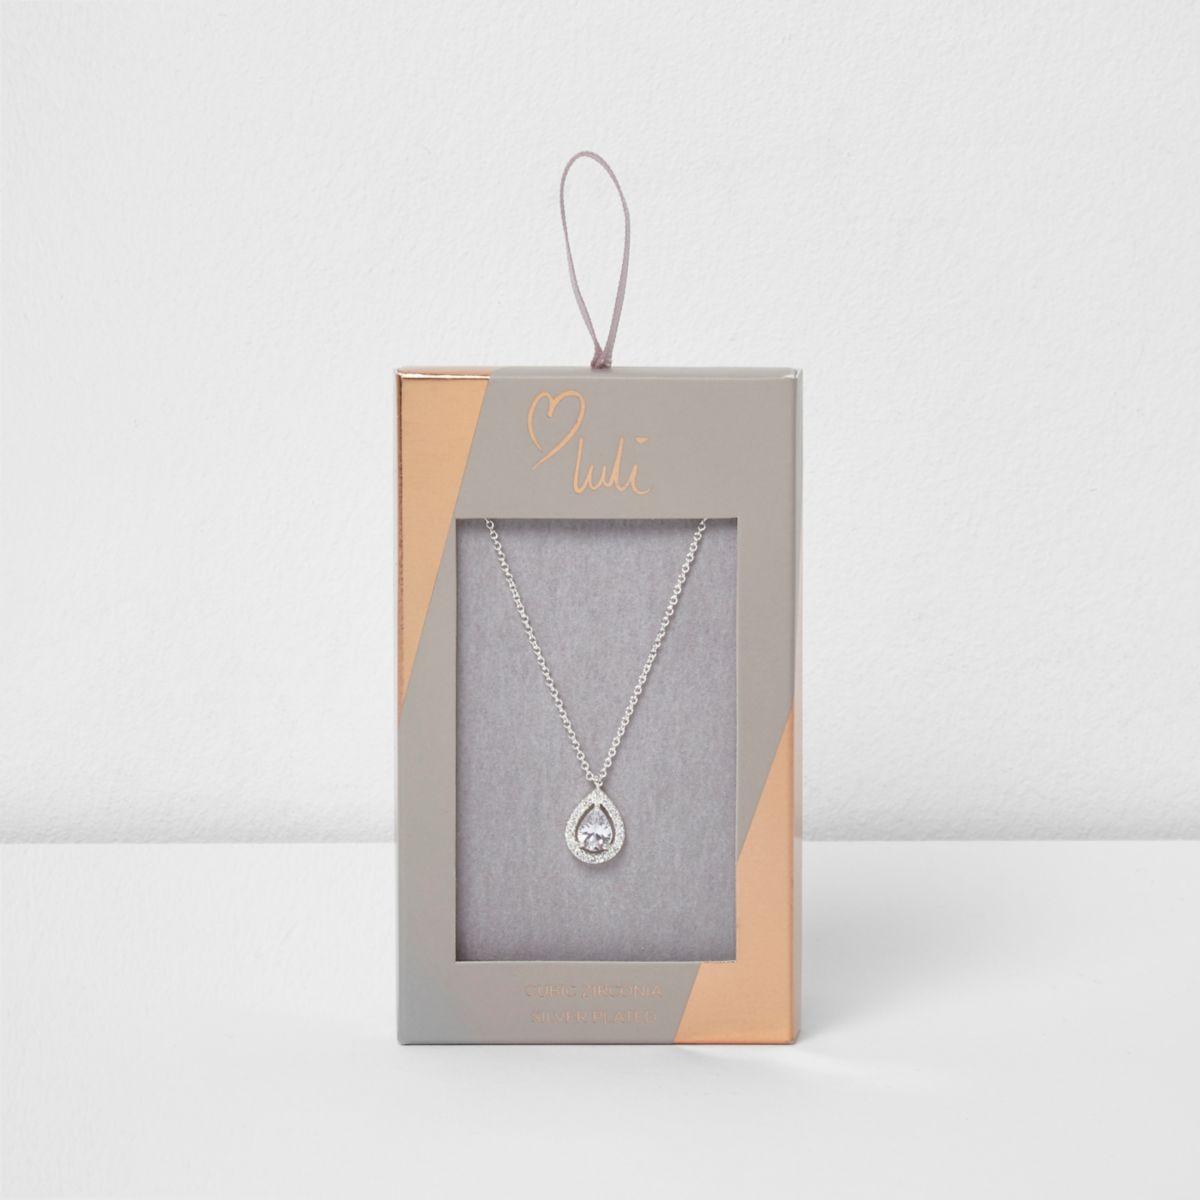 Silver plated Love Luli teardrop necklace